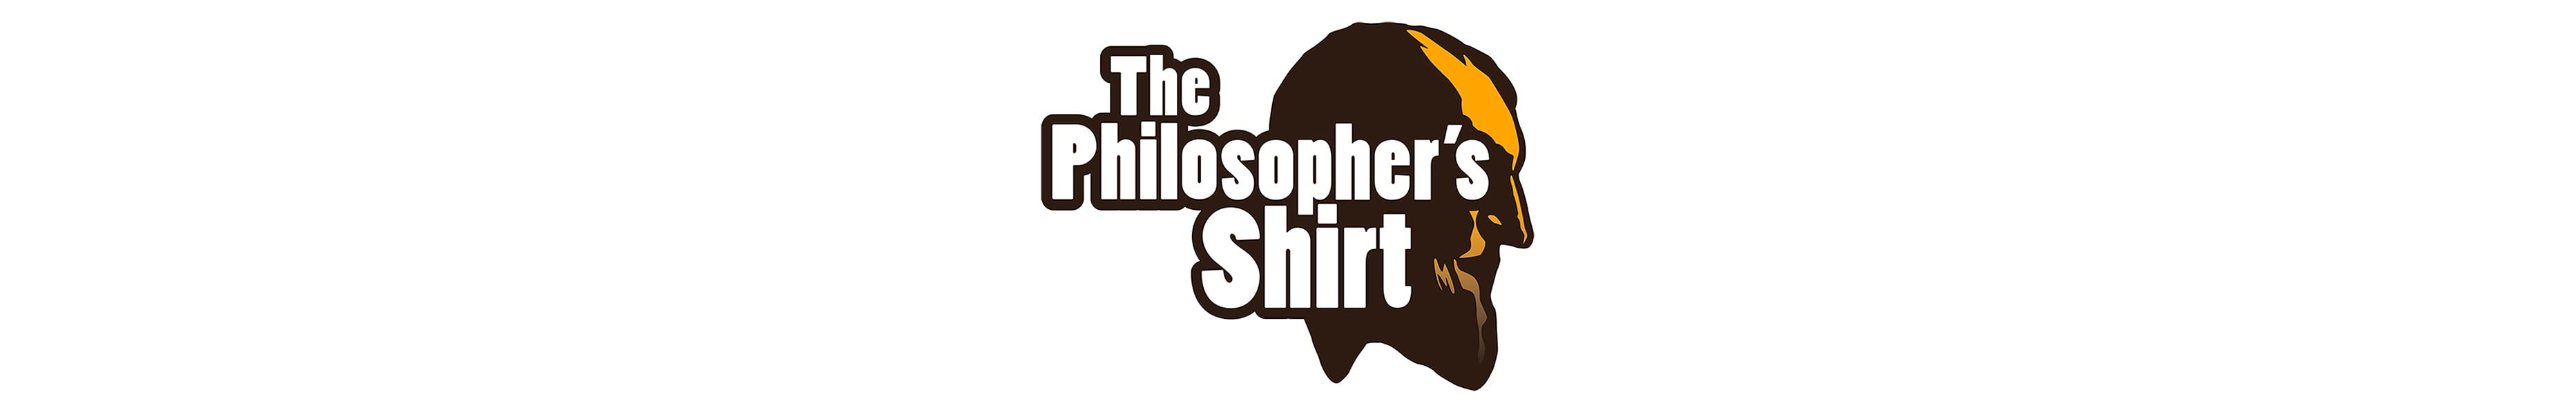 The Philosopher's Shirt